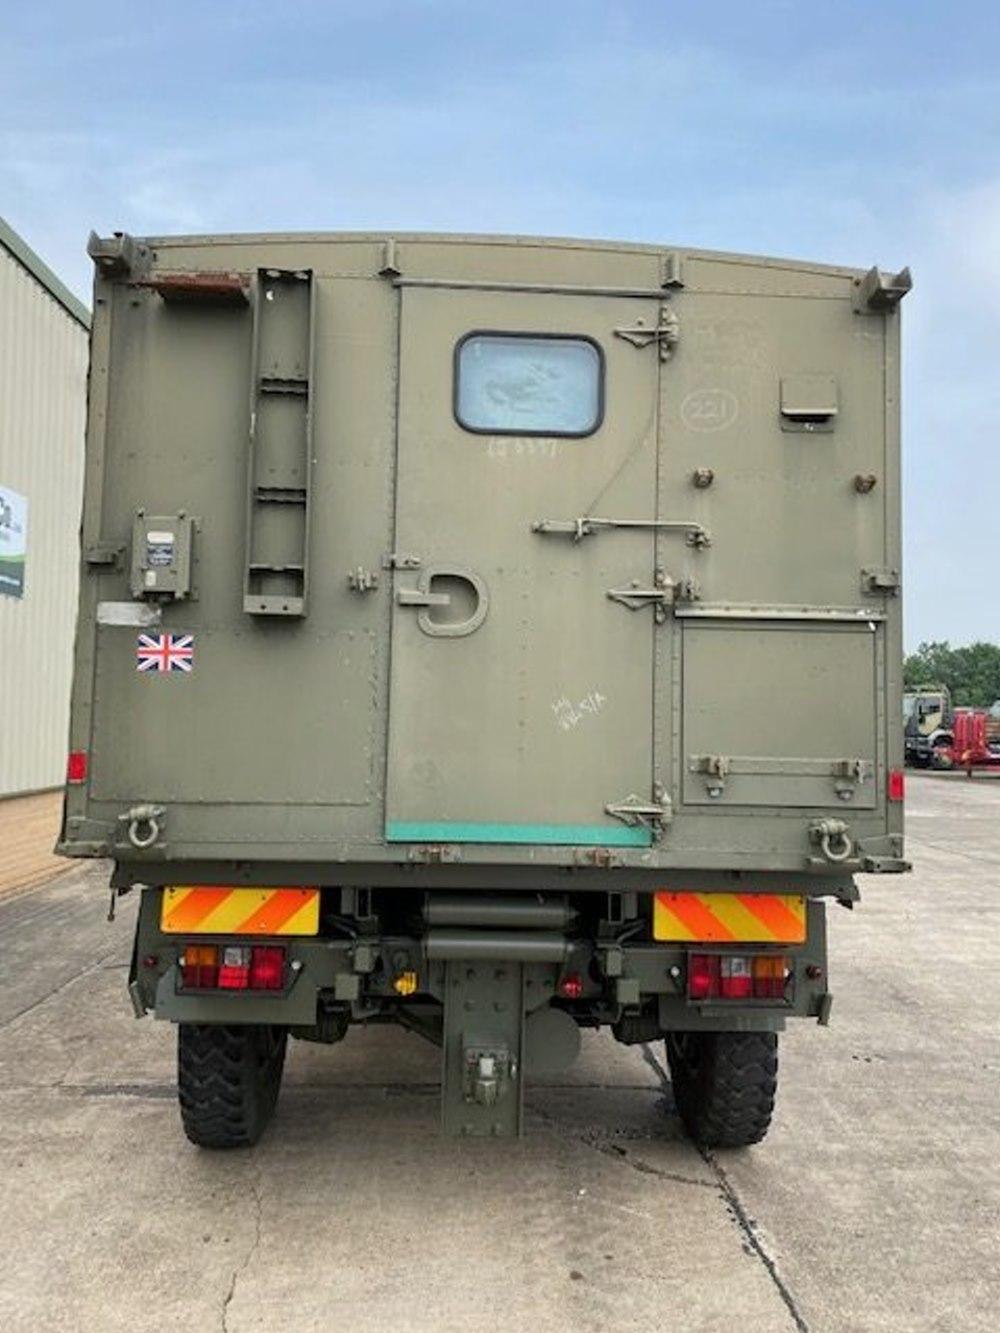 Leyland Daf 45.150 4x4 RHD box vehicle | Конверсионная техника с военного хранения